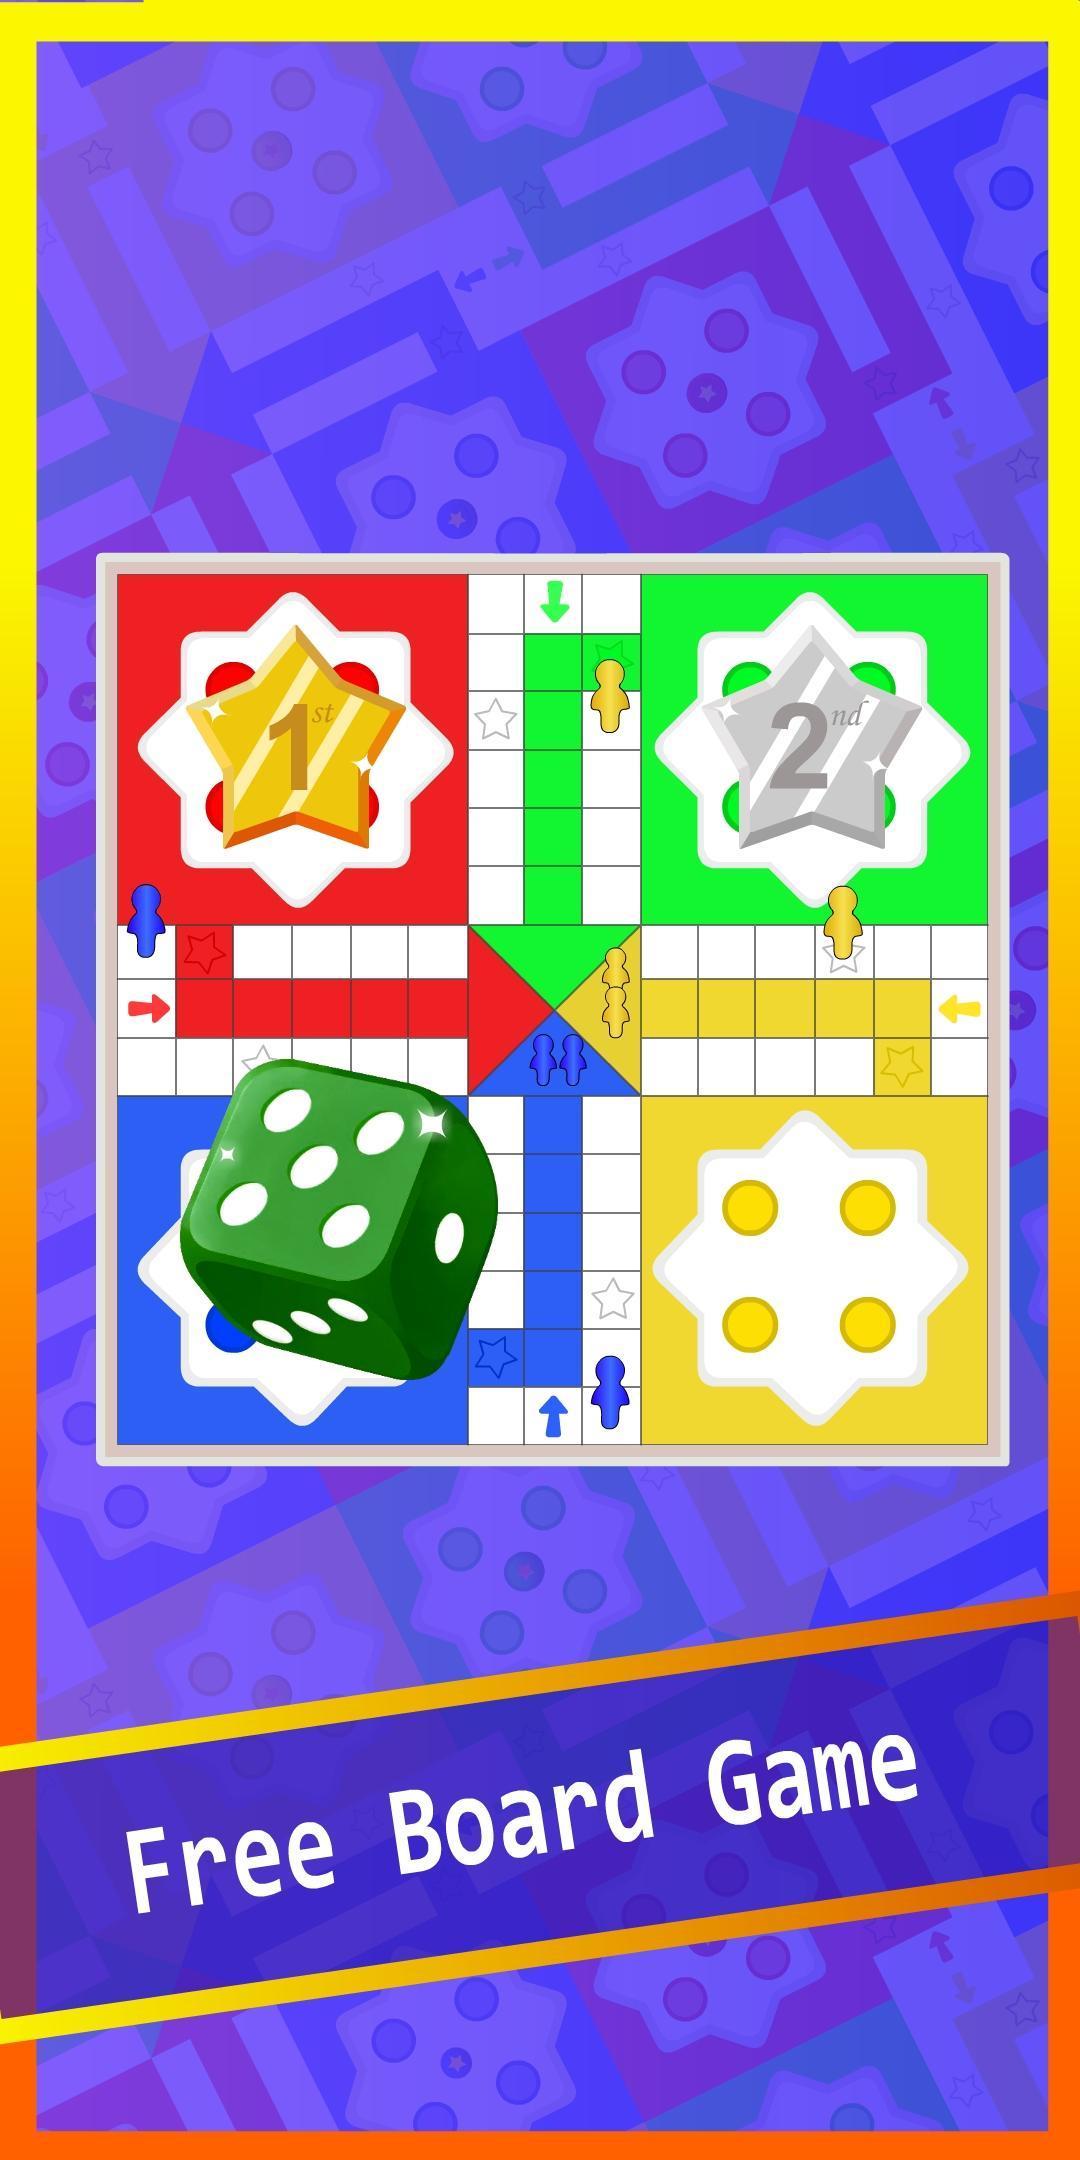 Ludo Club - Ludo Classic - King of Board Games 👑 1.5 Screenshot 2